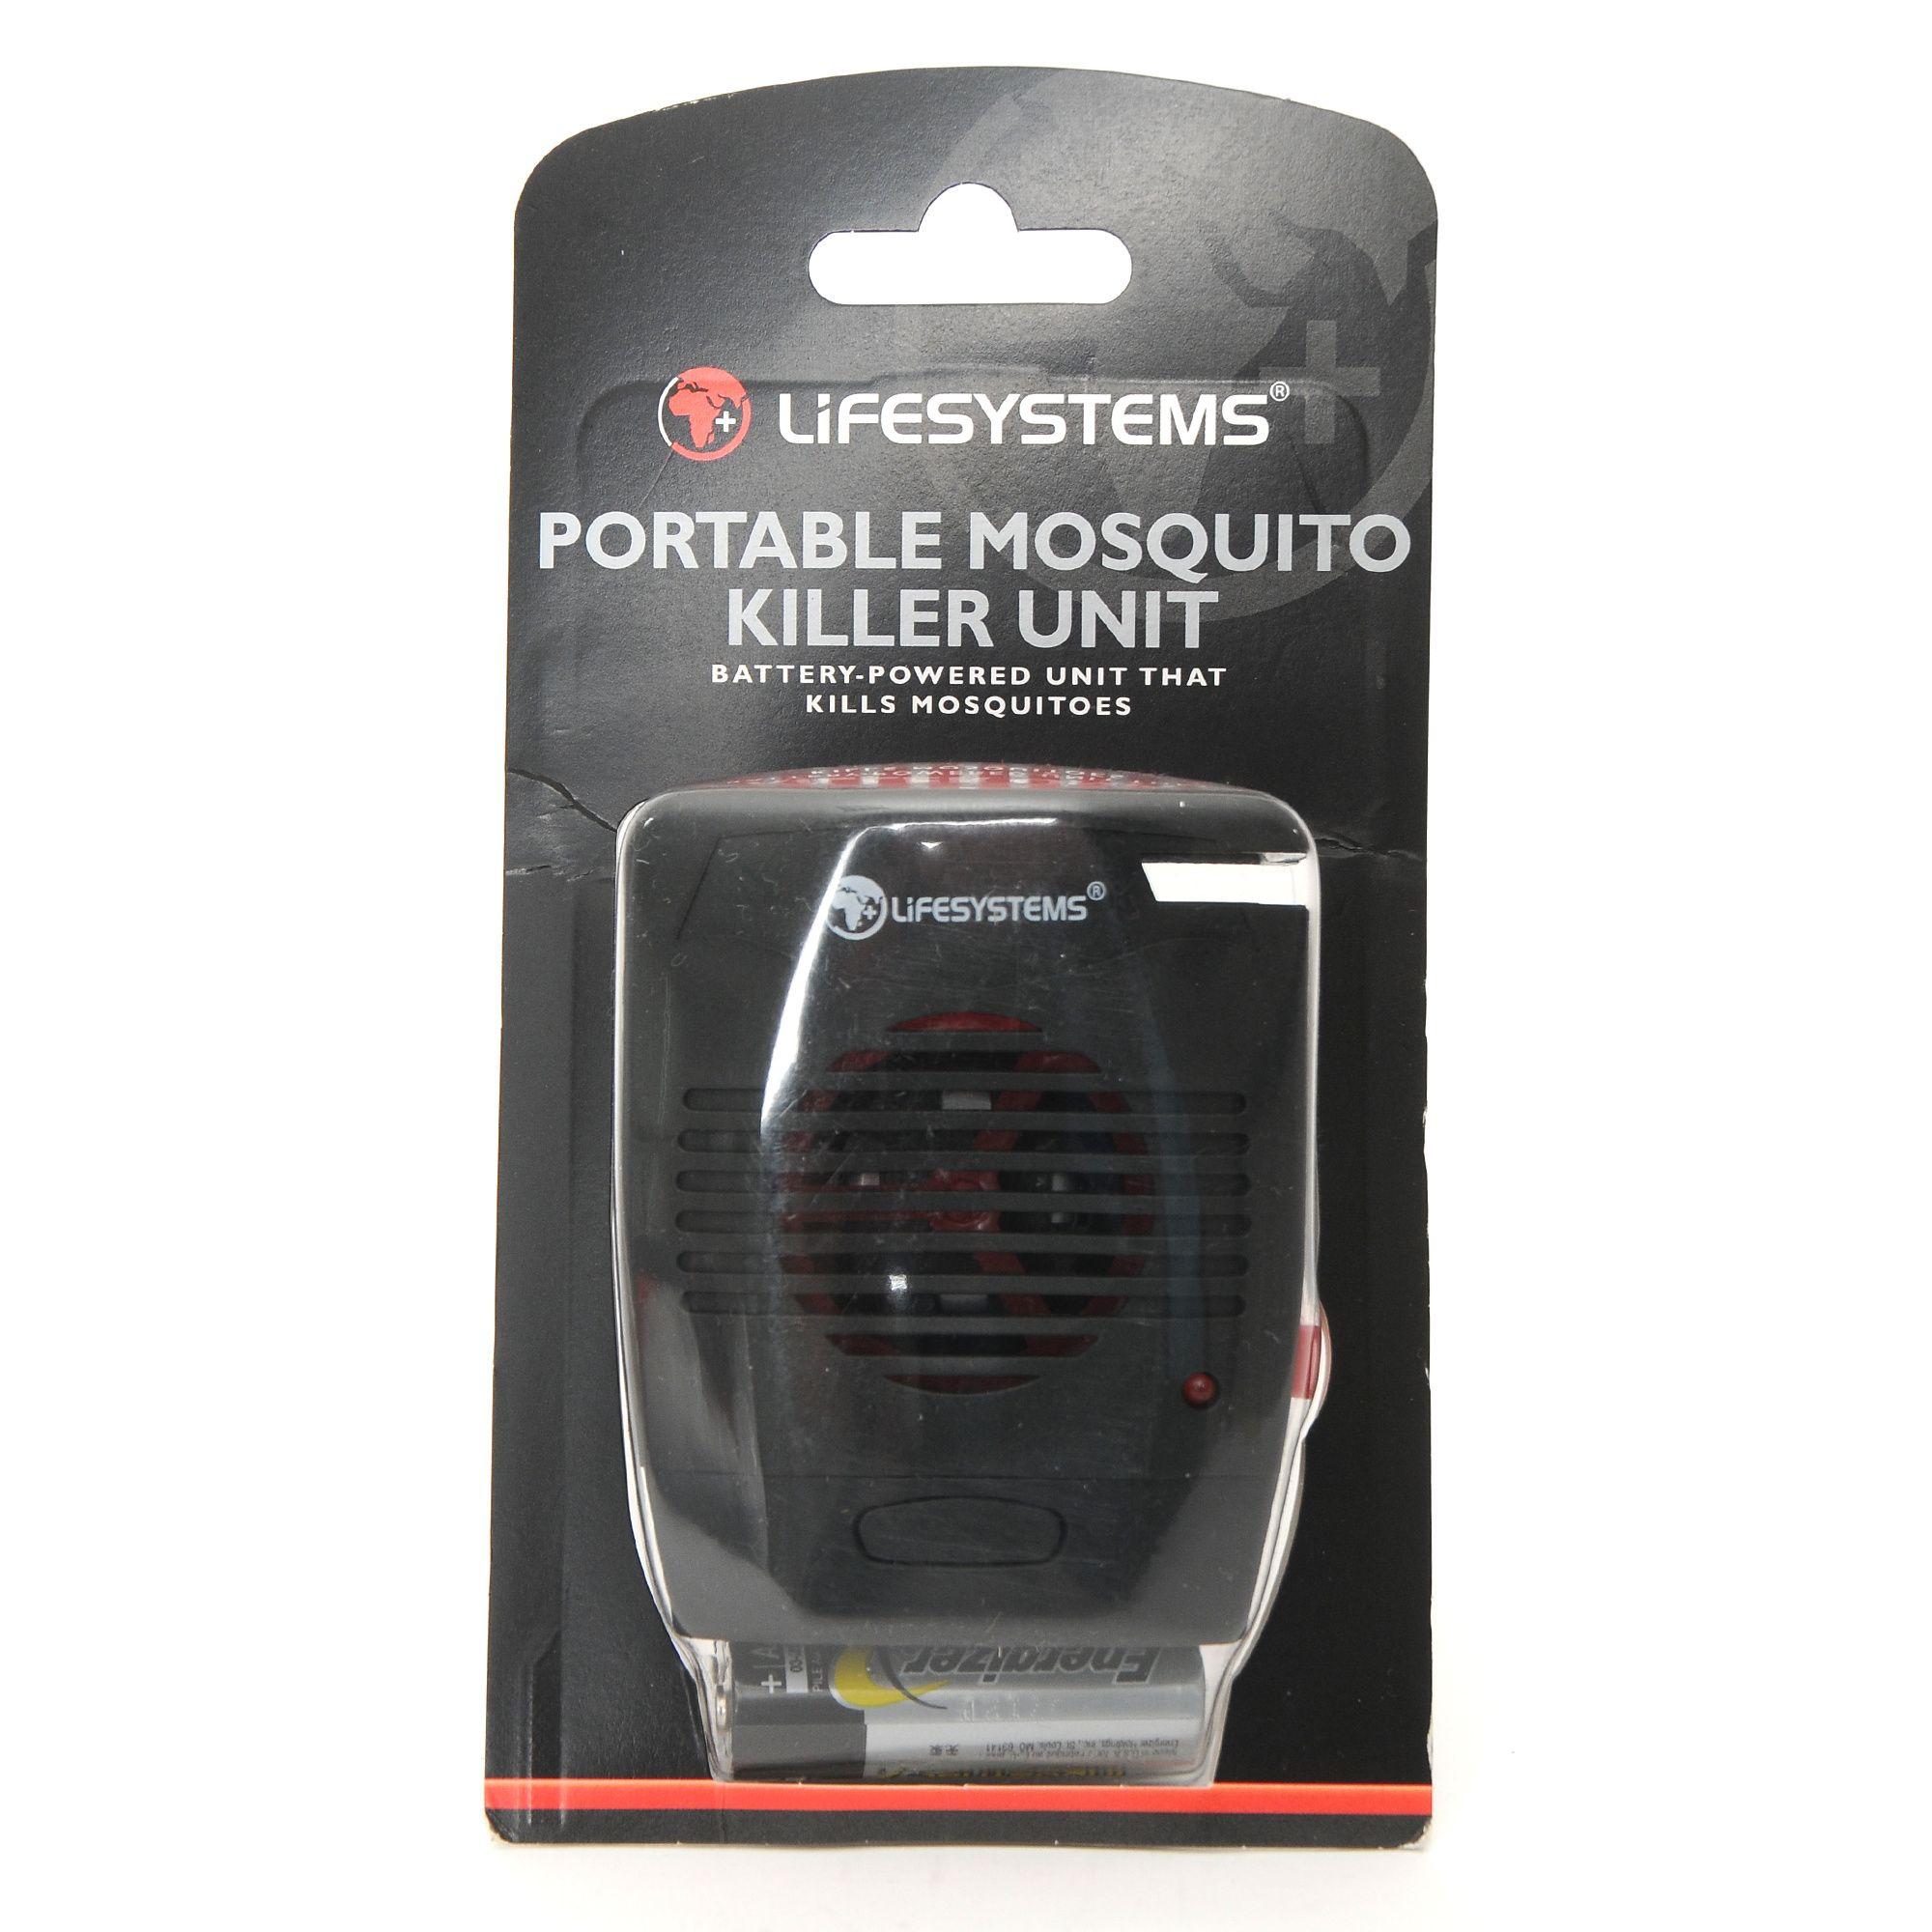 LIFESYSTEMS Portable Mosquito Killer Unit